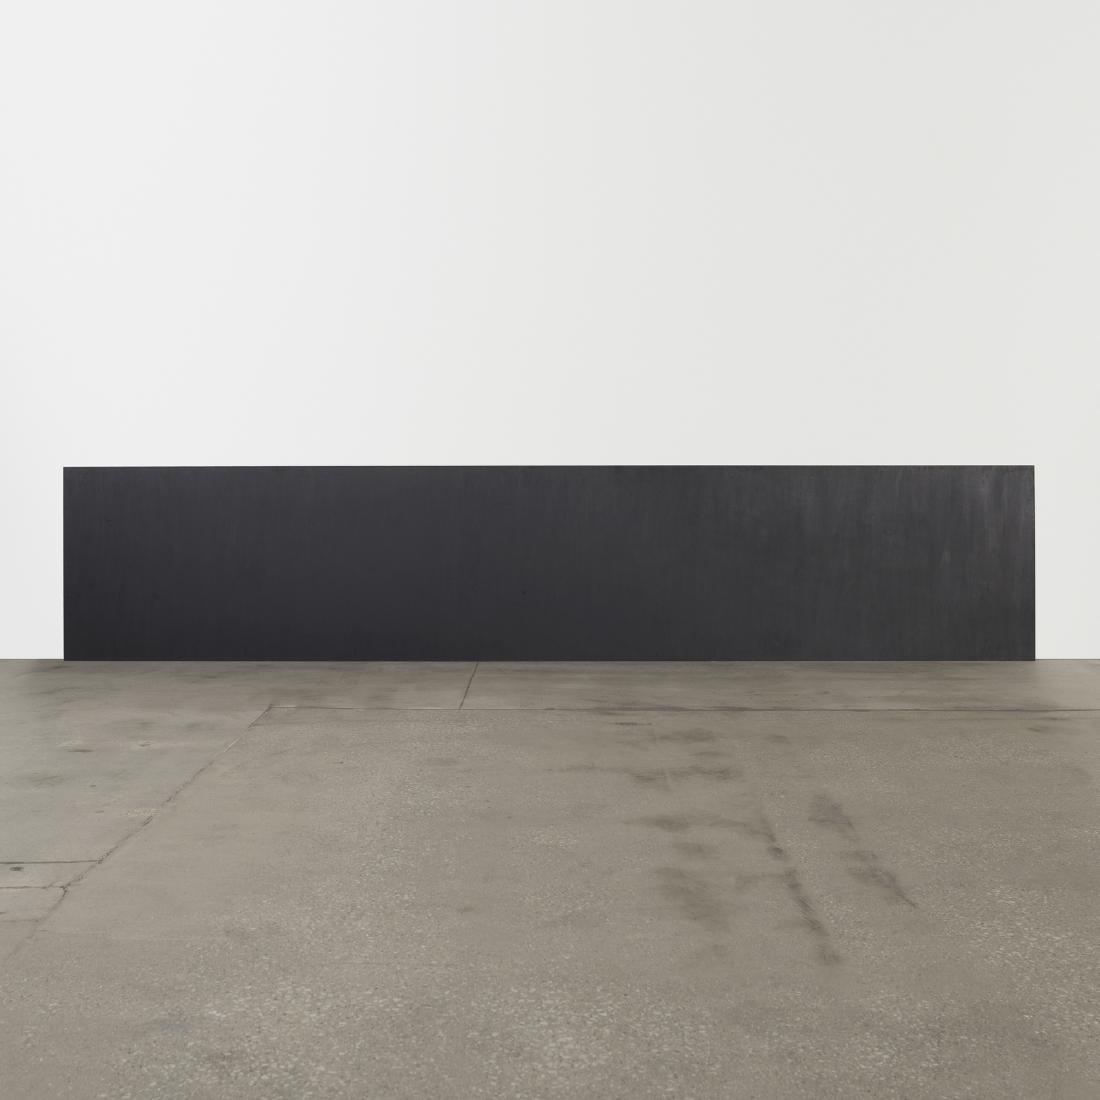 Richard Serra, Horizontal Rectangle to the Floor